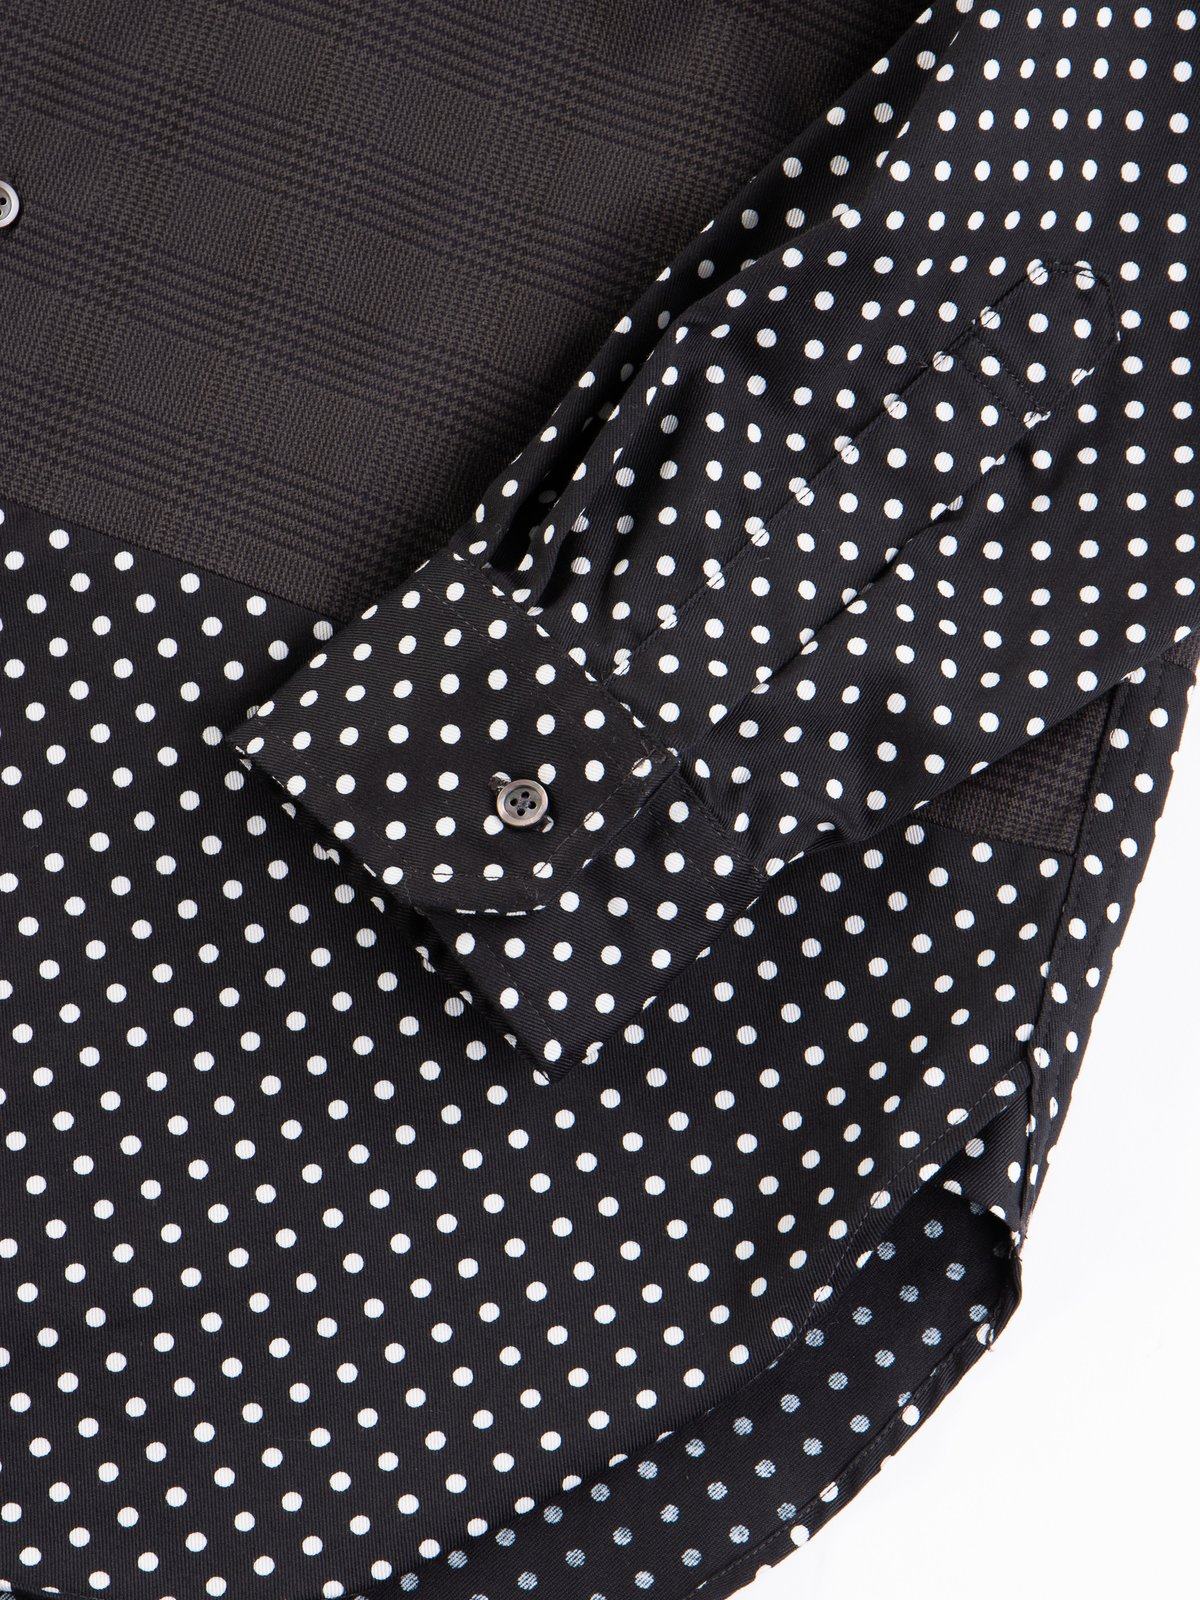 Grey Twill Printed Glen Plaid Spread Collar Shirt - Image 4